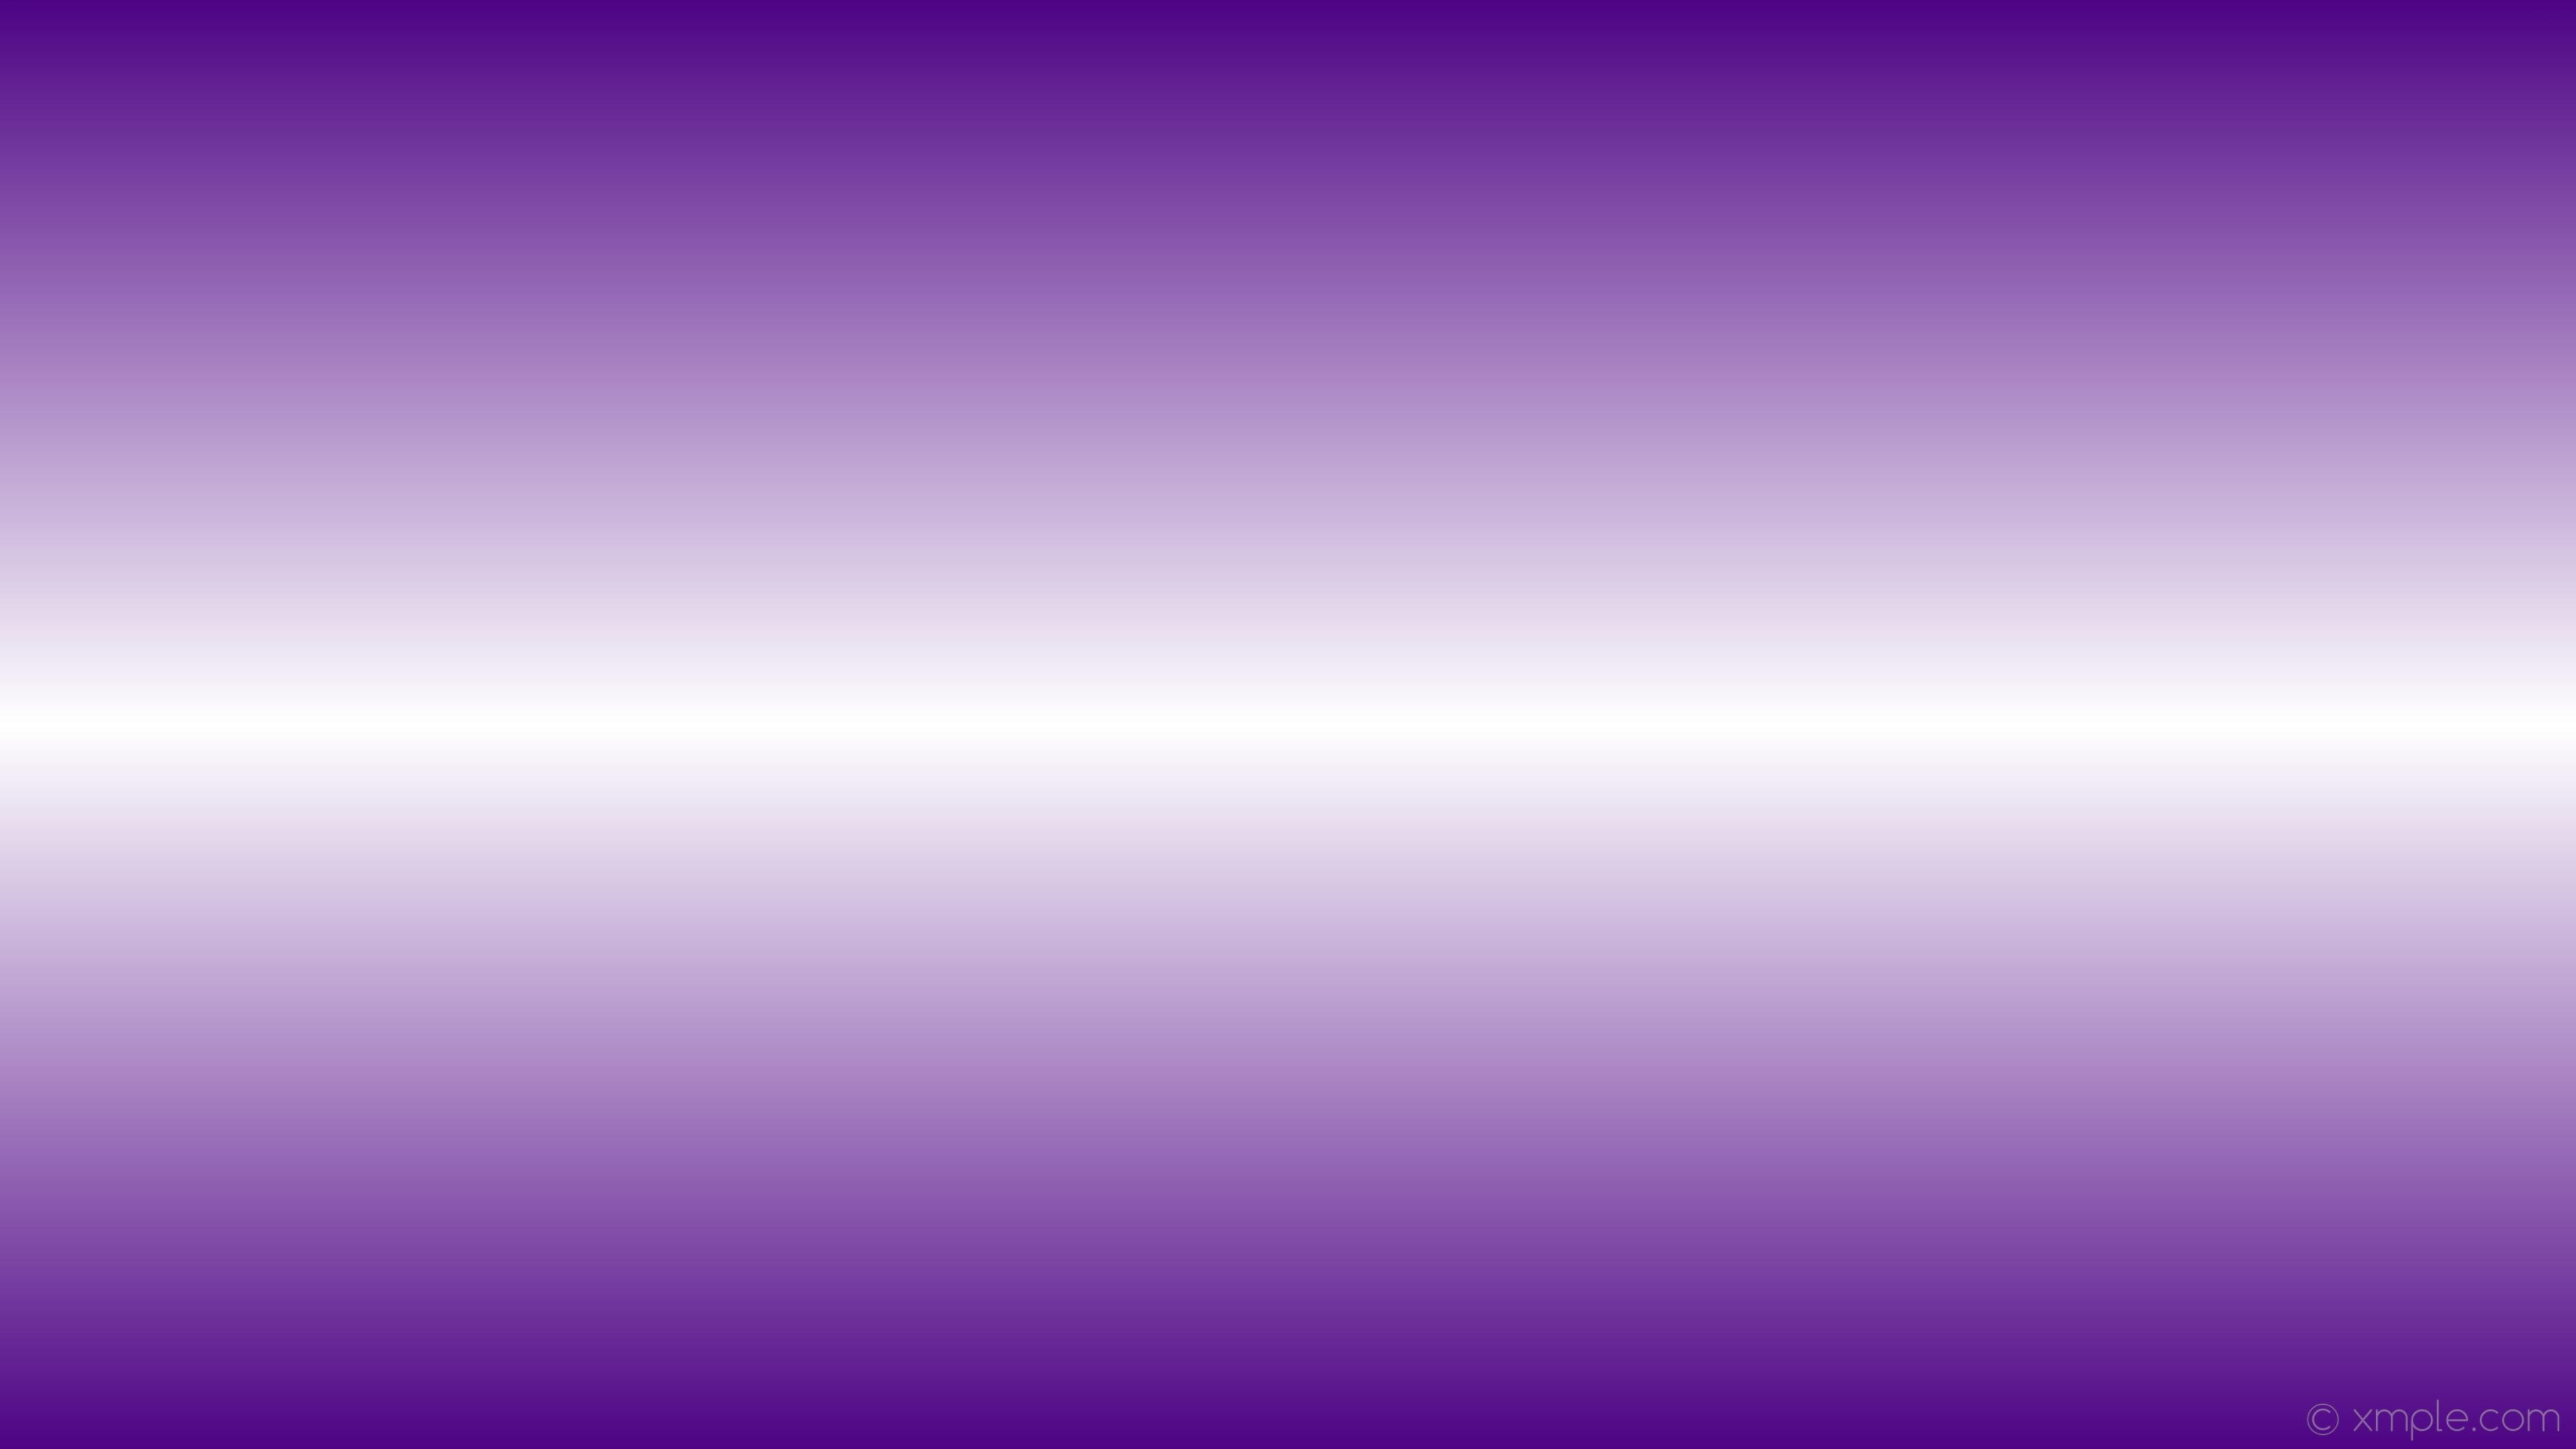 Dark Floral Iphone Wallpaper Purple Ombre Wallpaper 68 Images